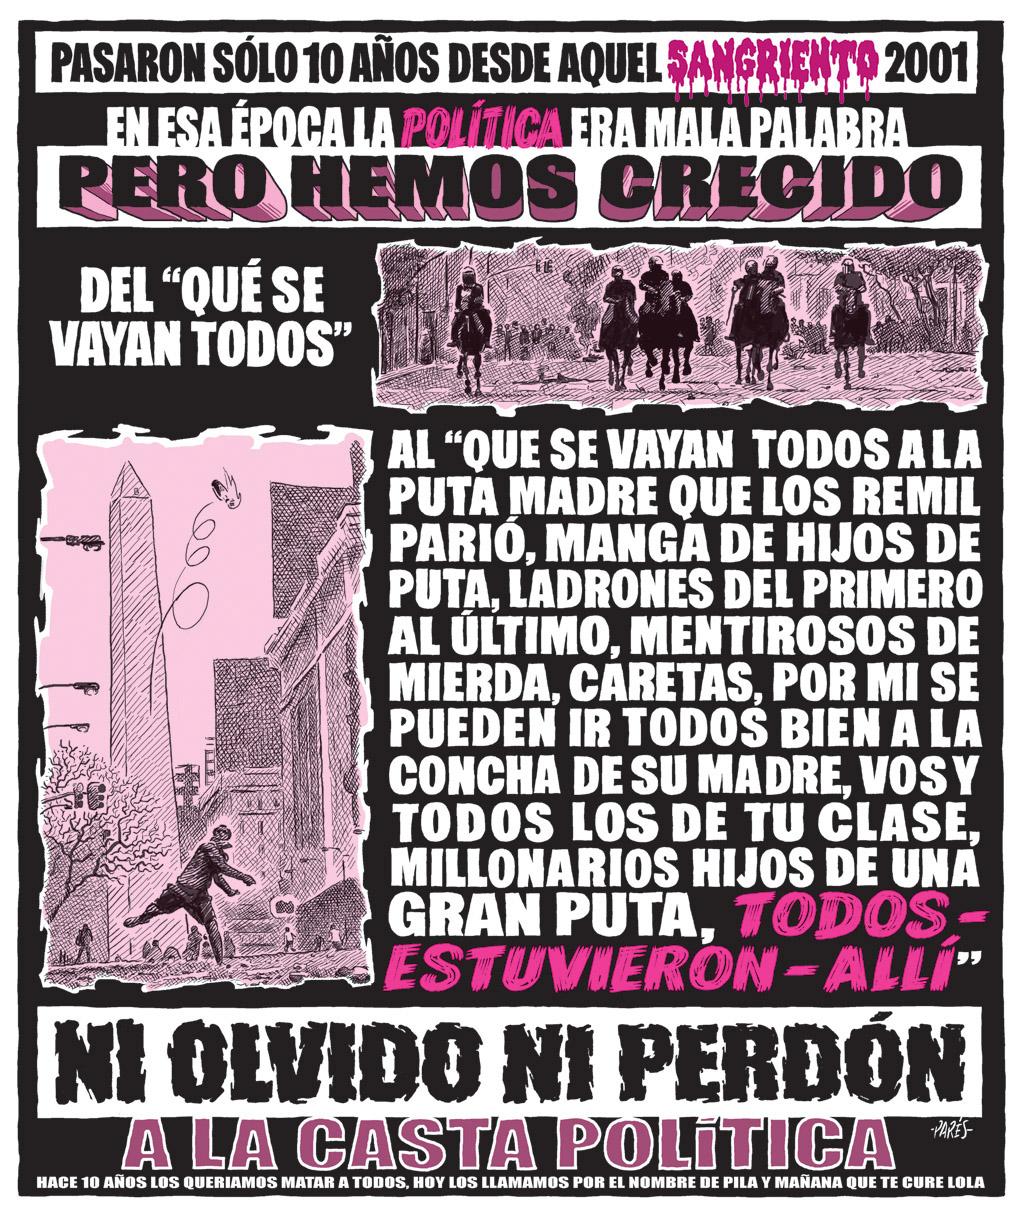 http://4.bp.blogspot.com/-FMiBZoc2ooM/Tu6LH7655TI/AAAAAAAABDo/gtURHyZbleY/s1600/Diego+Par%25C3%25A9s.+19+y+20+de+Diciembre.+Ni+Olvido+ni+perd%25C3%25B3n...+Barcelona+237+%25282001%2529.jpg